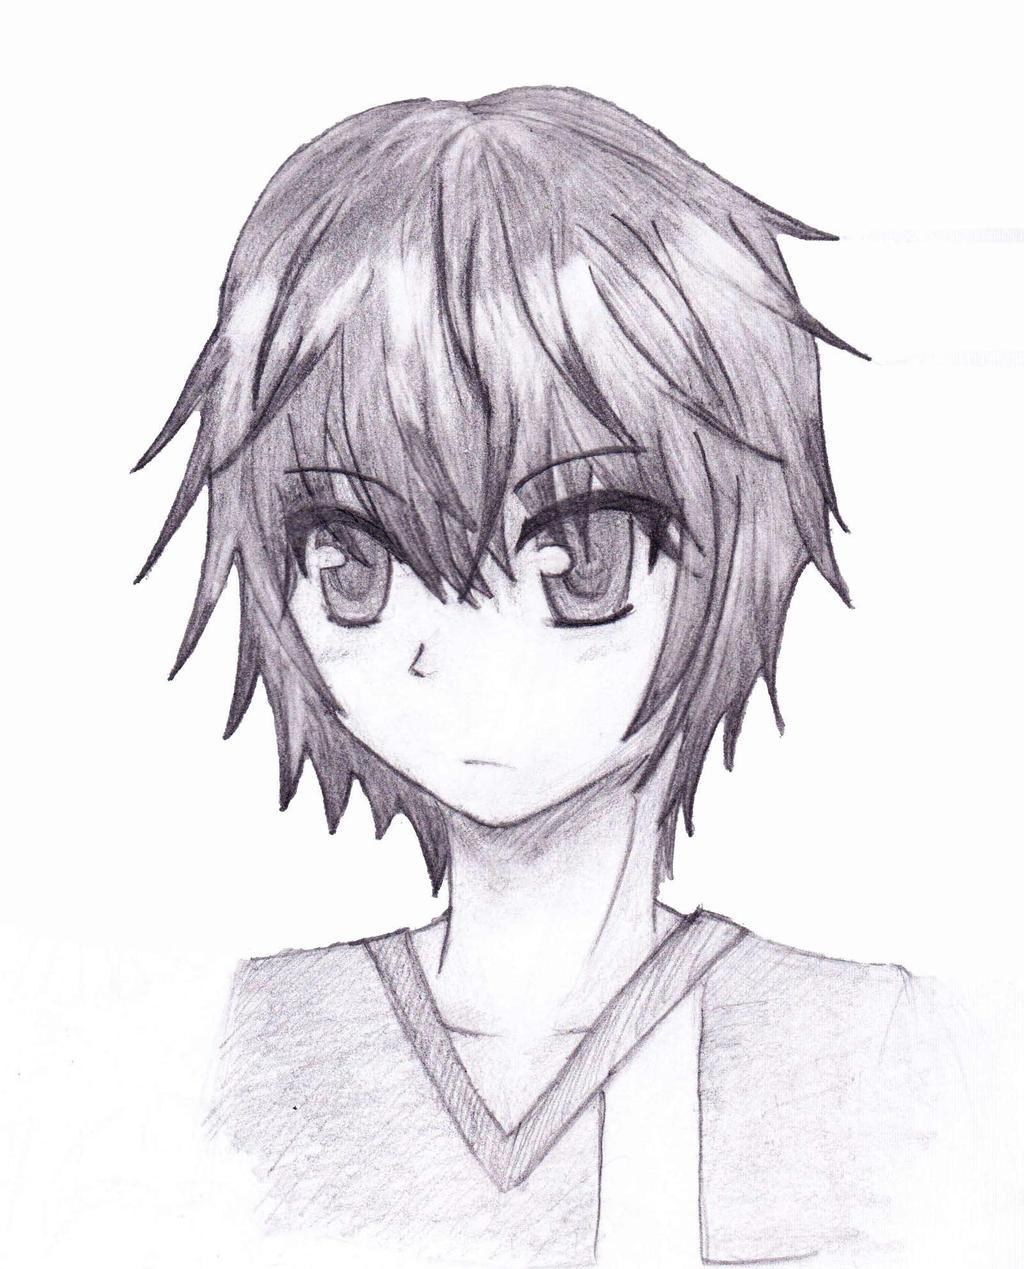 Sketch - Anime Boy by Blazing-Skies on DeviantArt